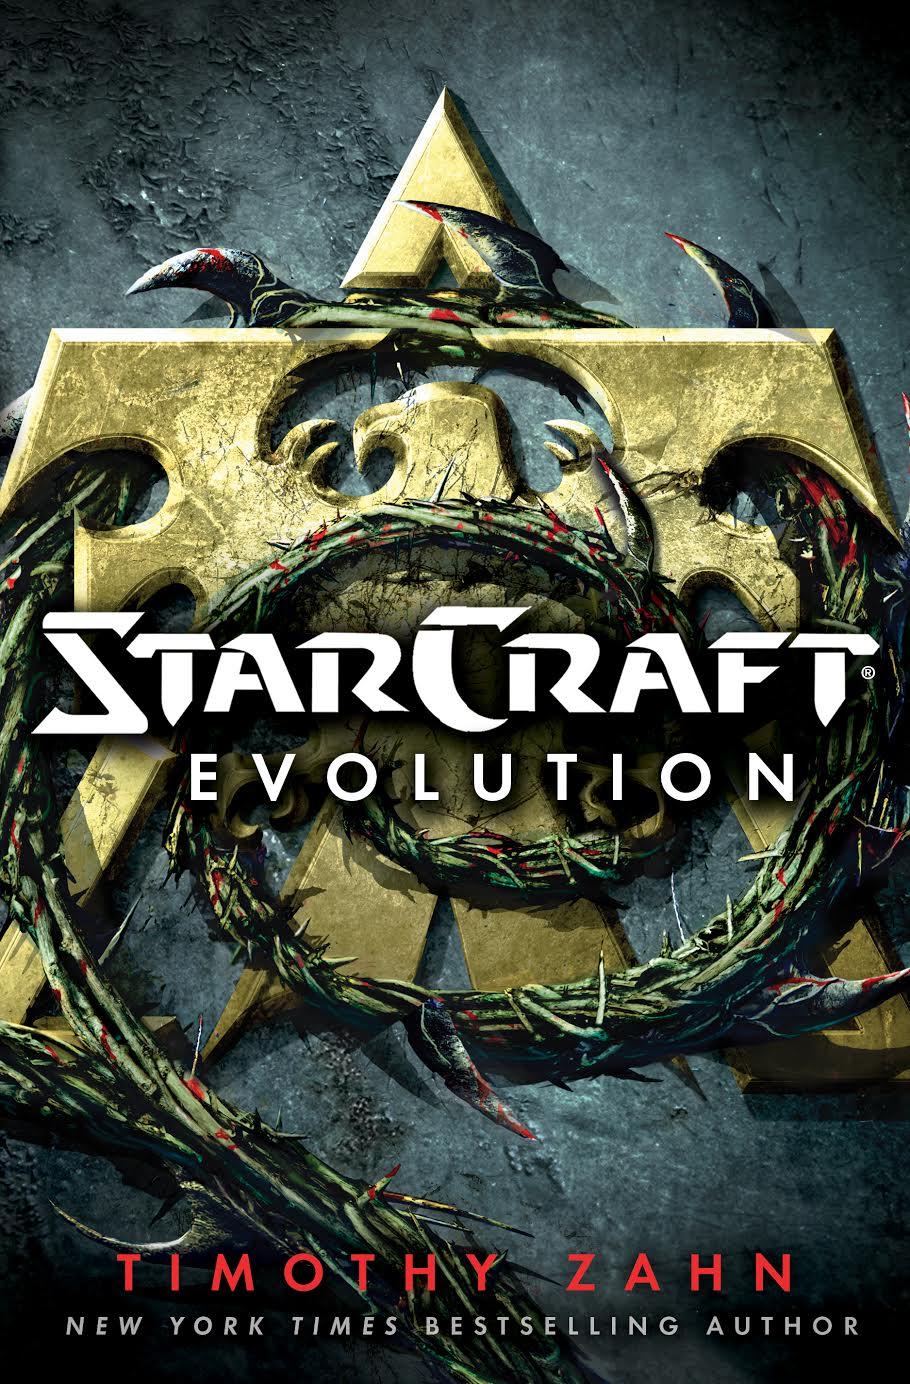 Starcraft Evolution